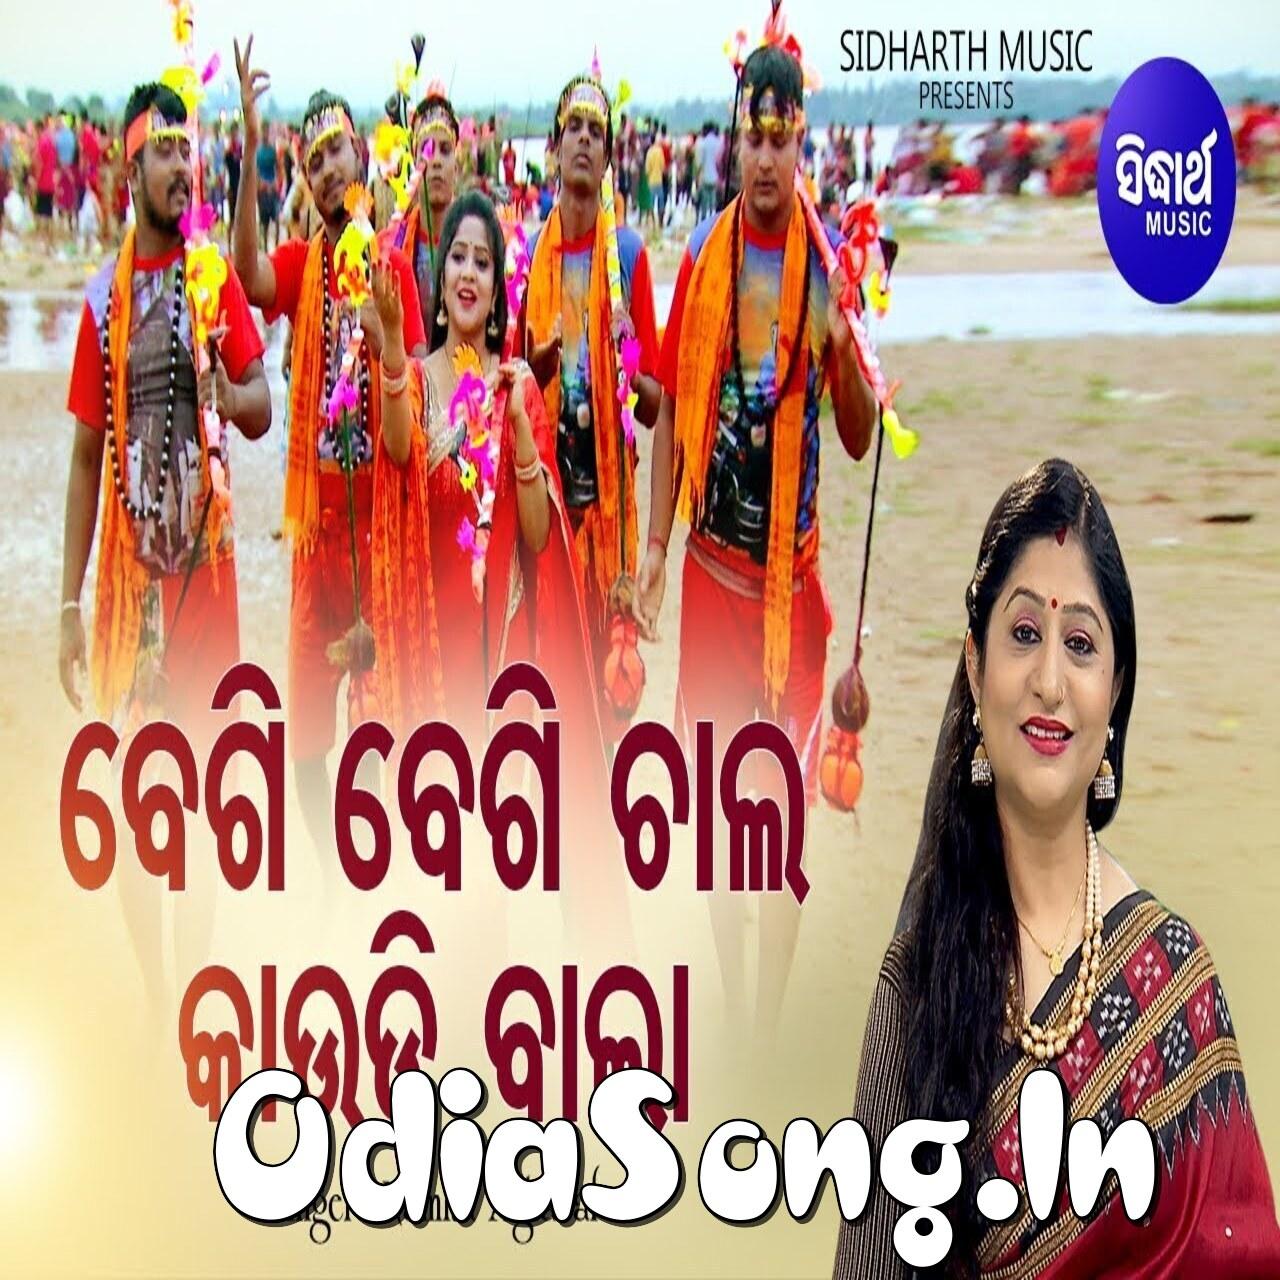 Begi Begi Chala Kaudi Bala (Namita Agrawal)